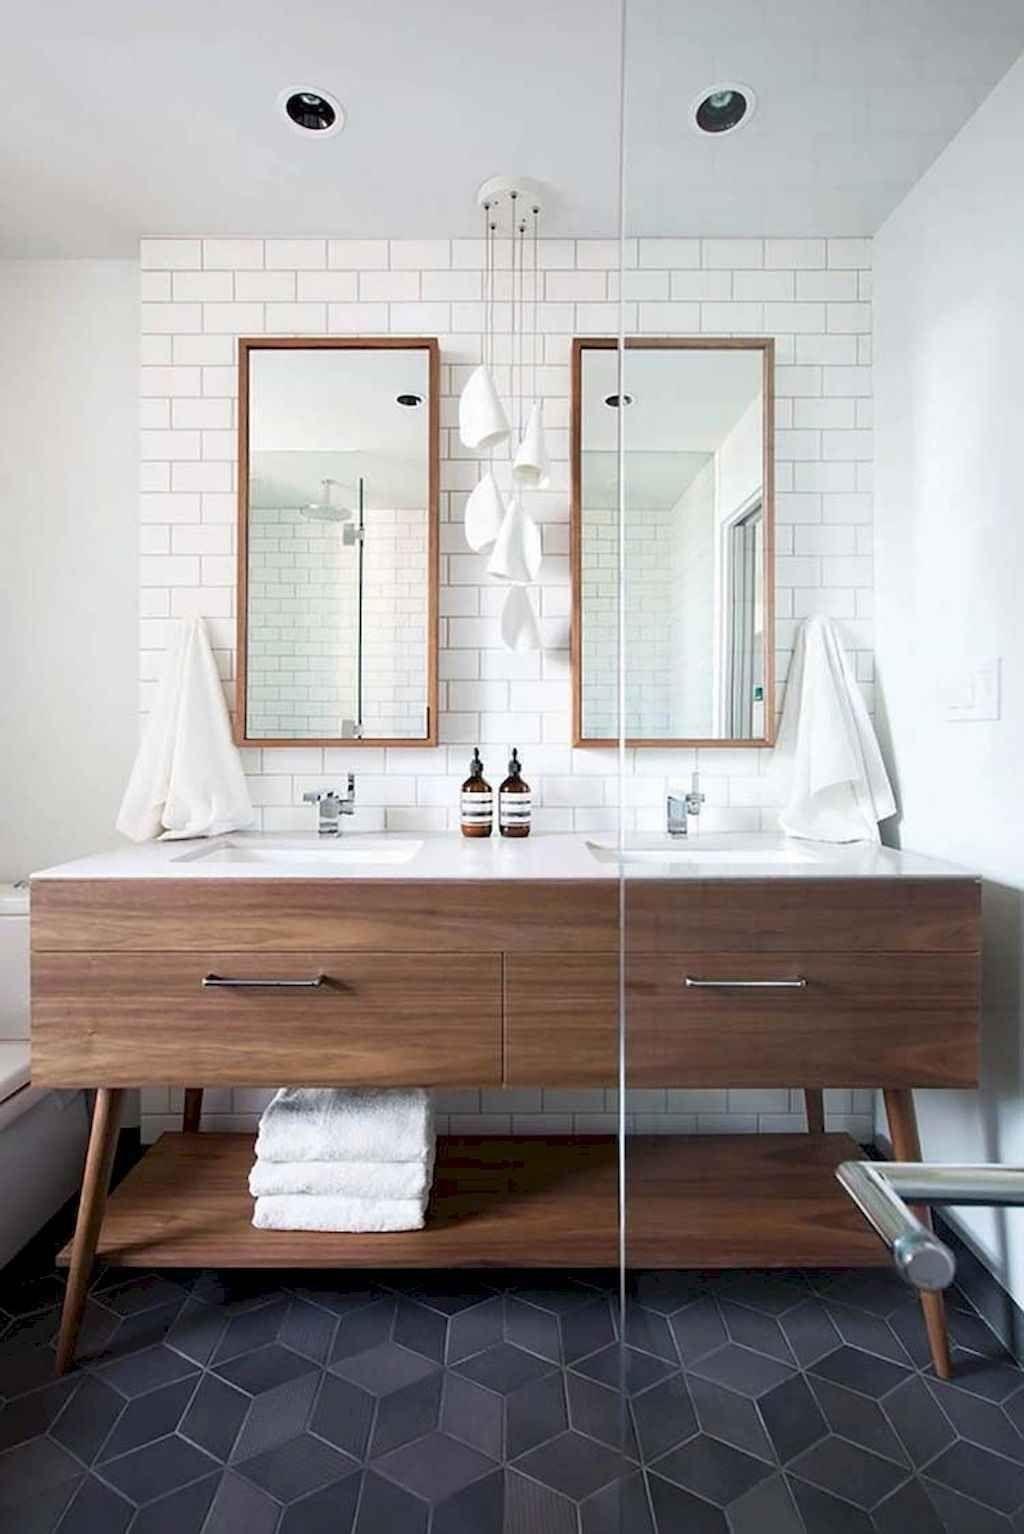 20 Popular Scandinavian Bathroom Ideas With Images Bathroom